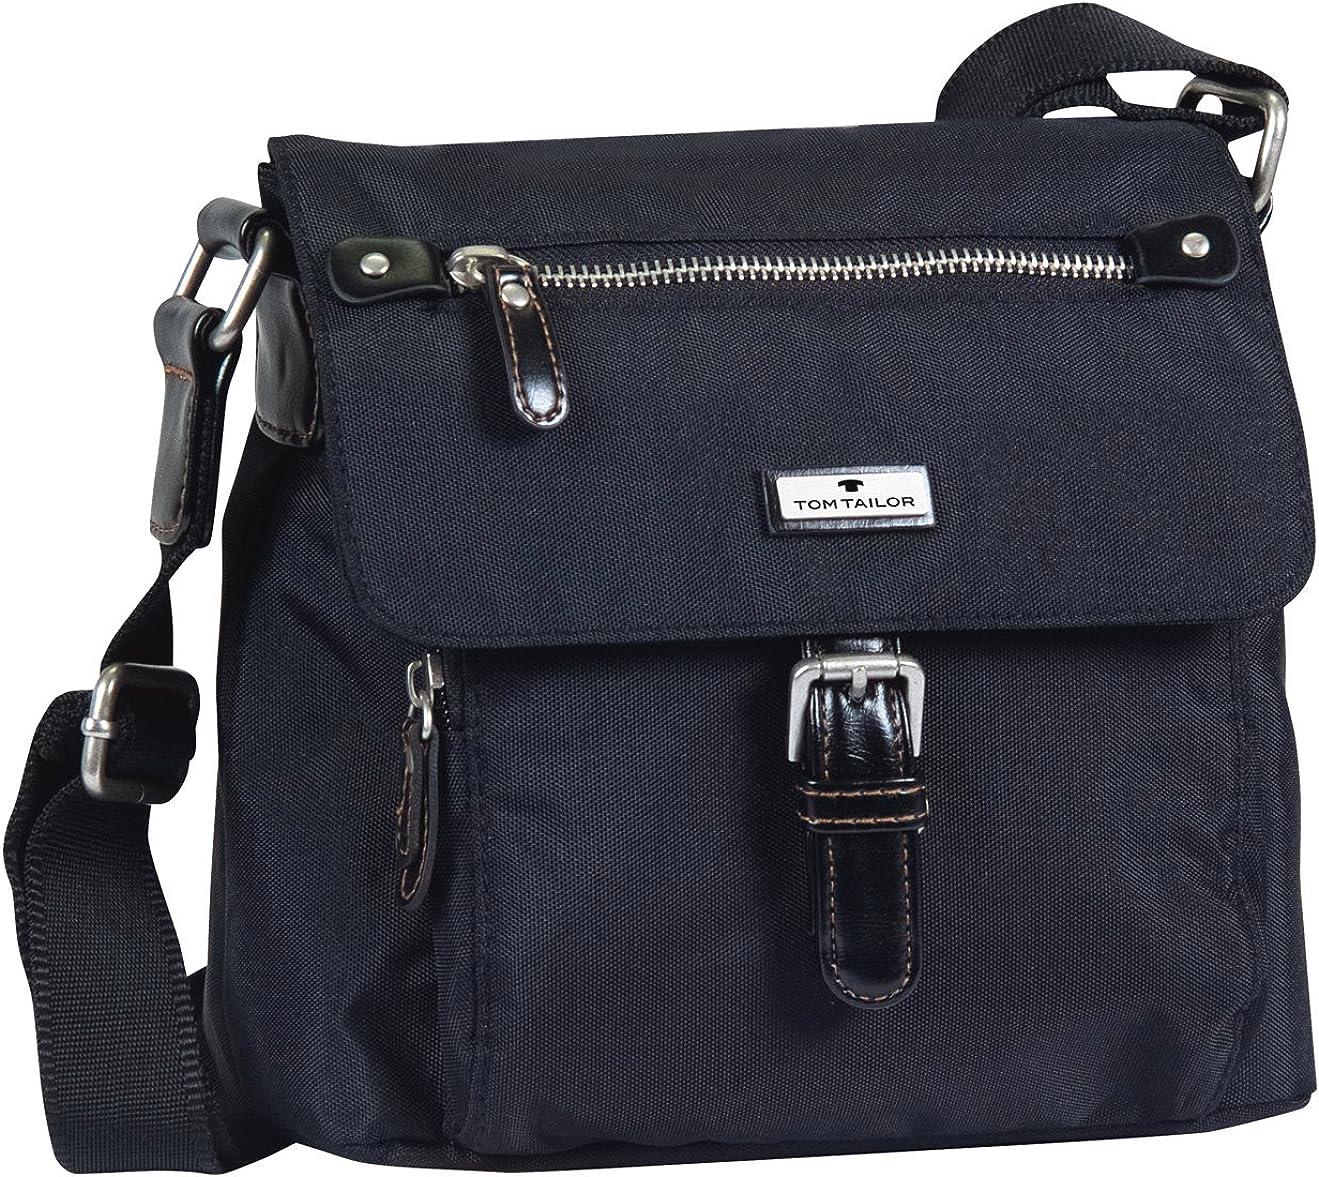 Tom Tailor Acc Women's Rina 11220 Messenger Bag22x20x10 cm (B x H x T)